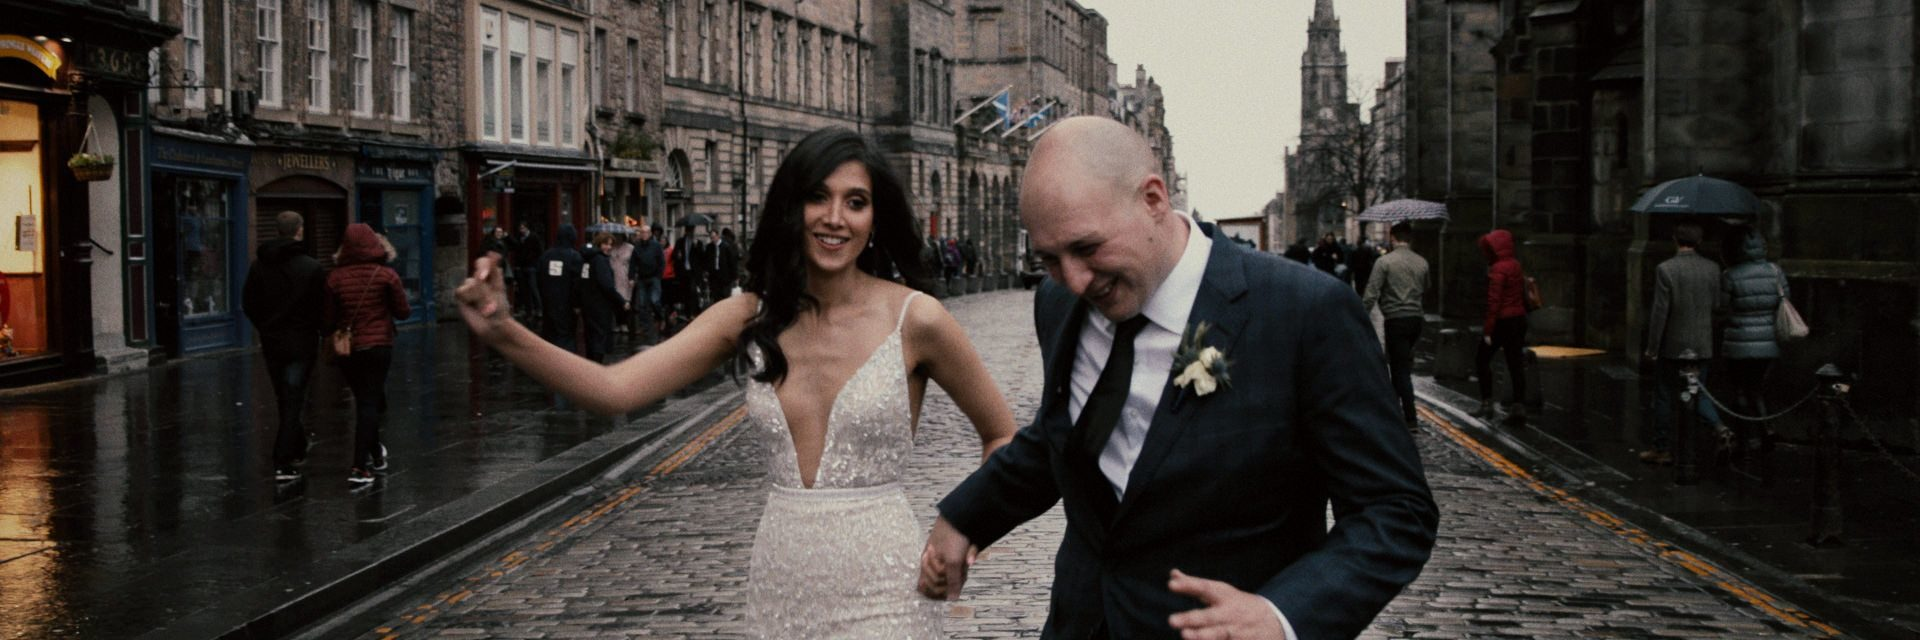 Tangier-wedding-videographer-cinemate-films-04